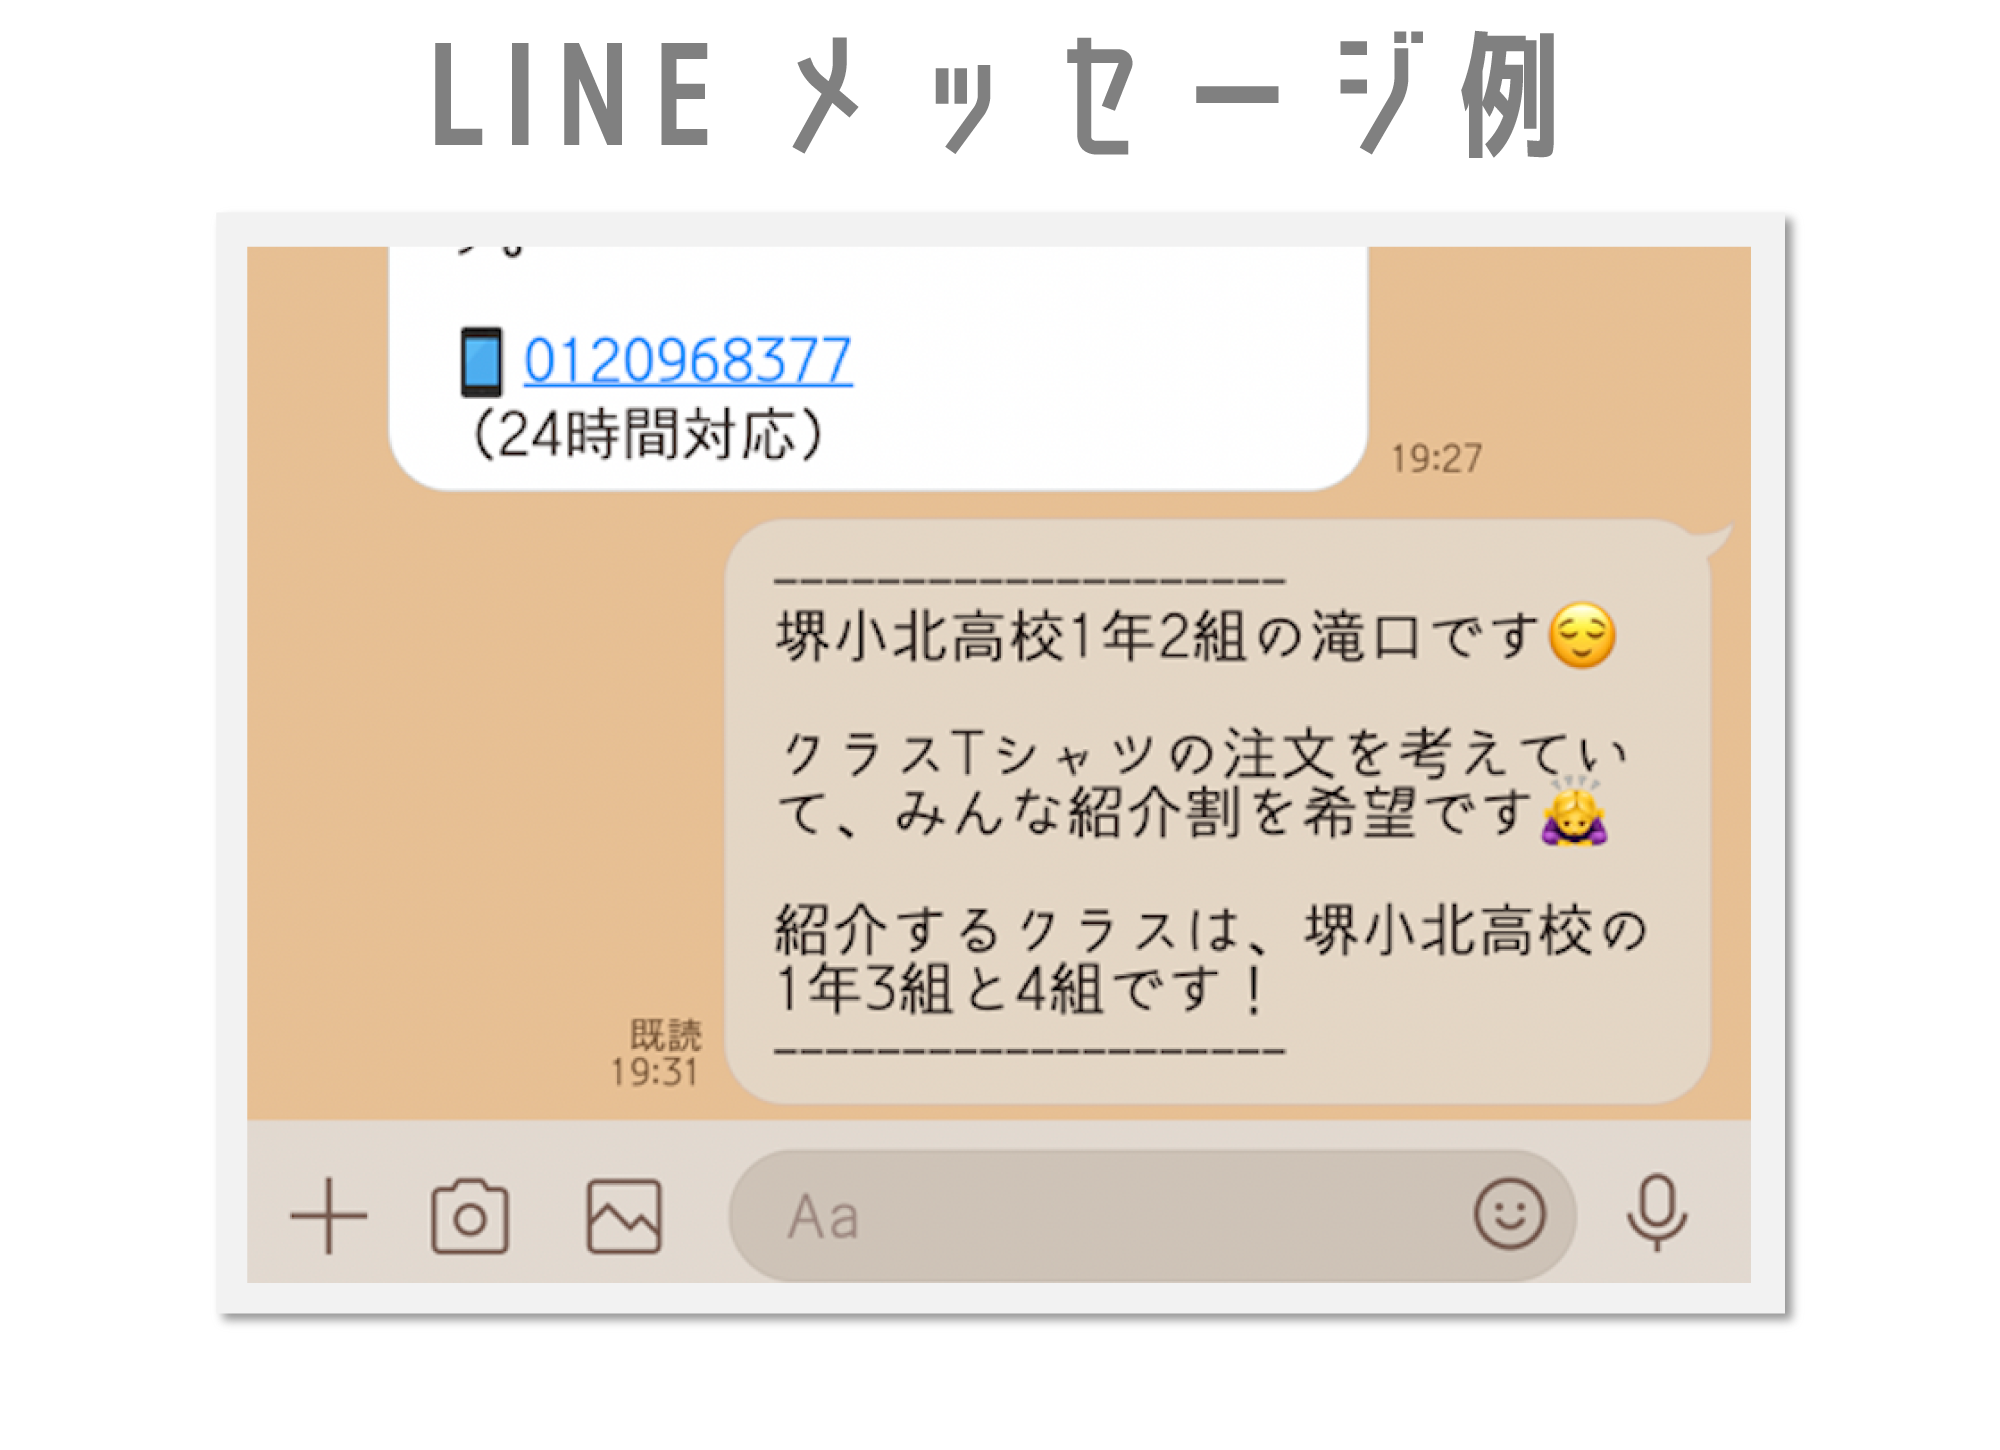 LINEメッセージ例